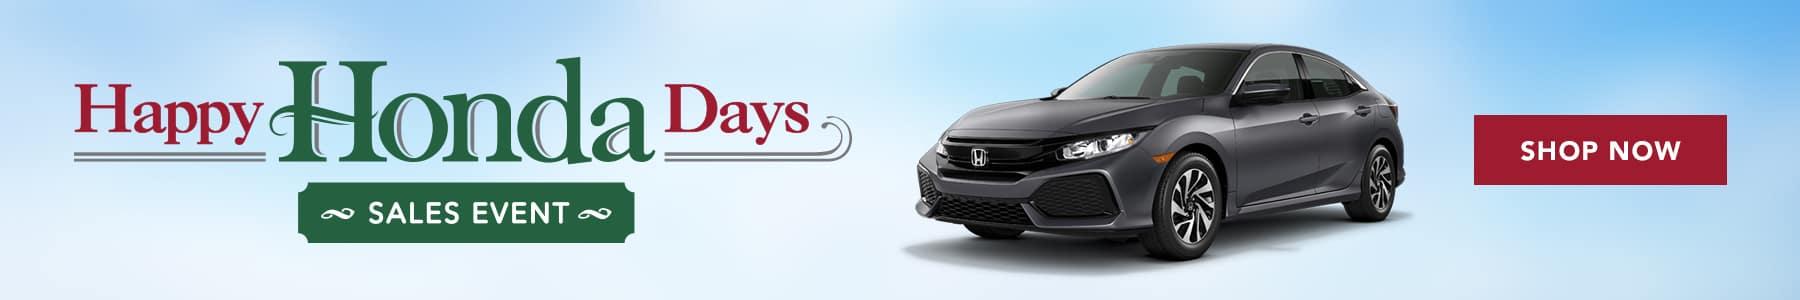 Happy Honda Days 2017